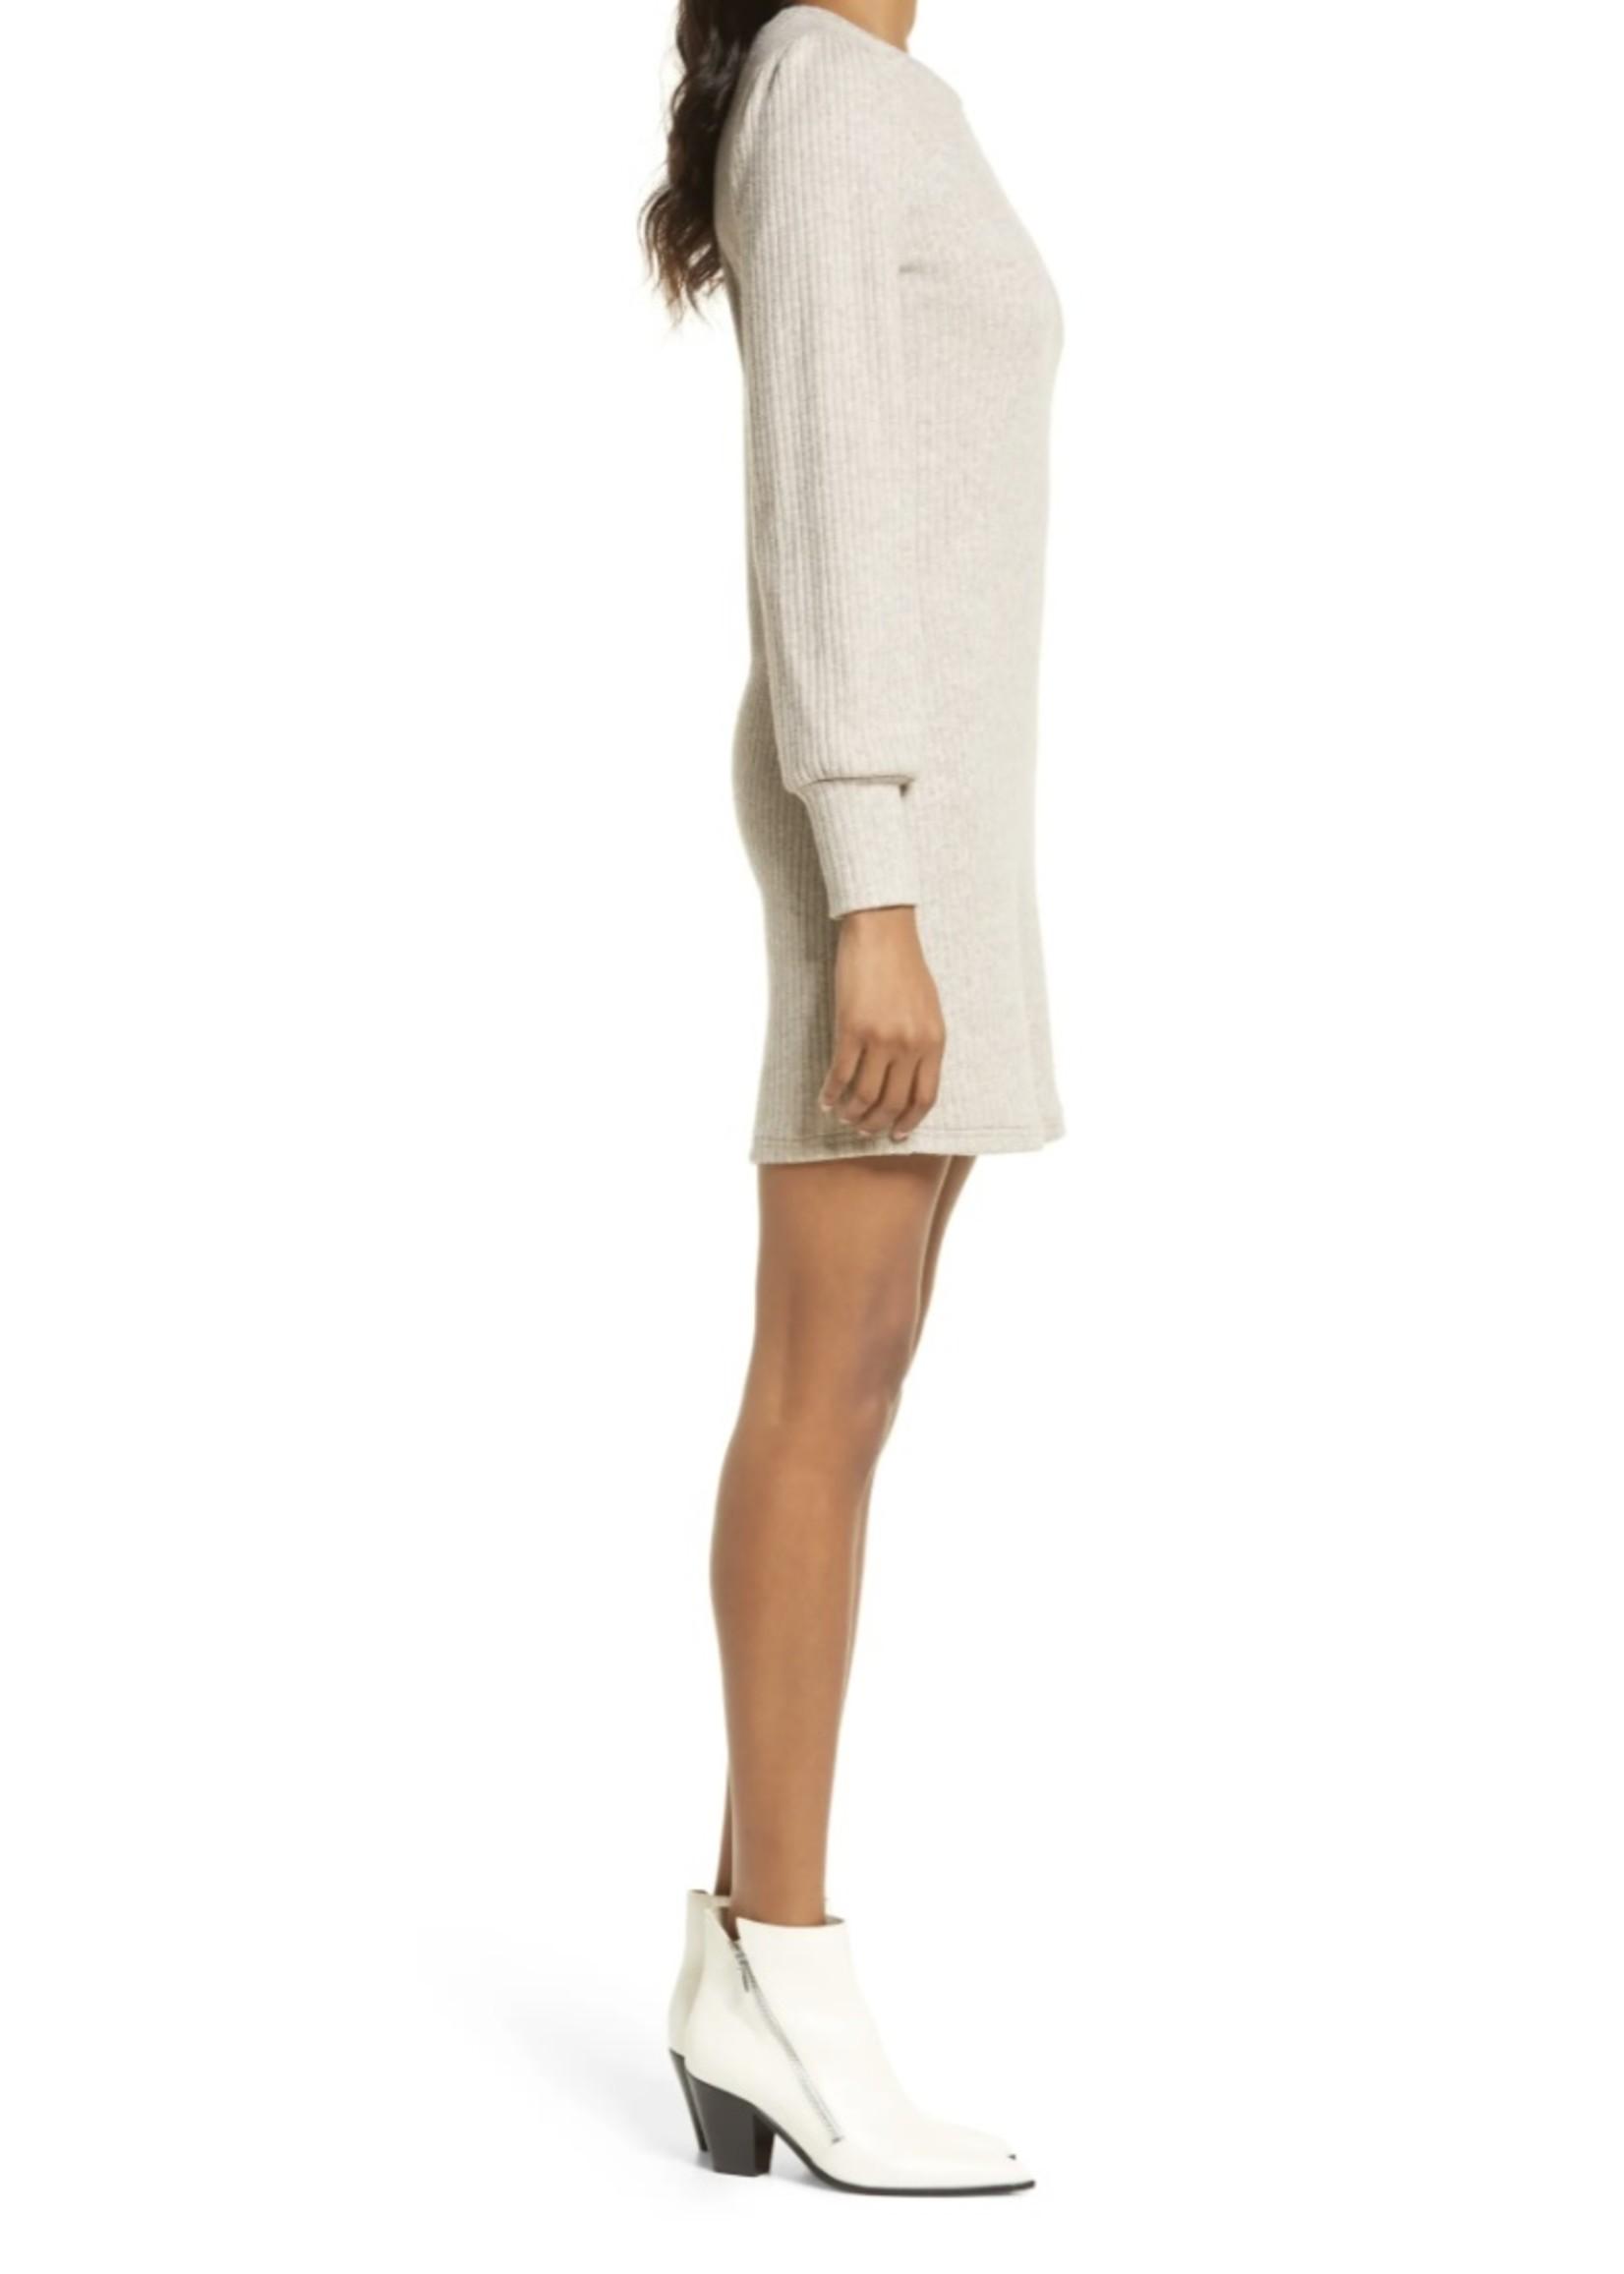 BB Dakota Evermore Dress - BL308287